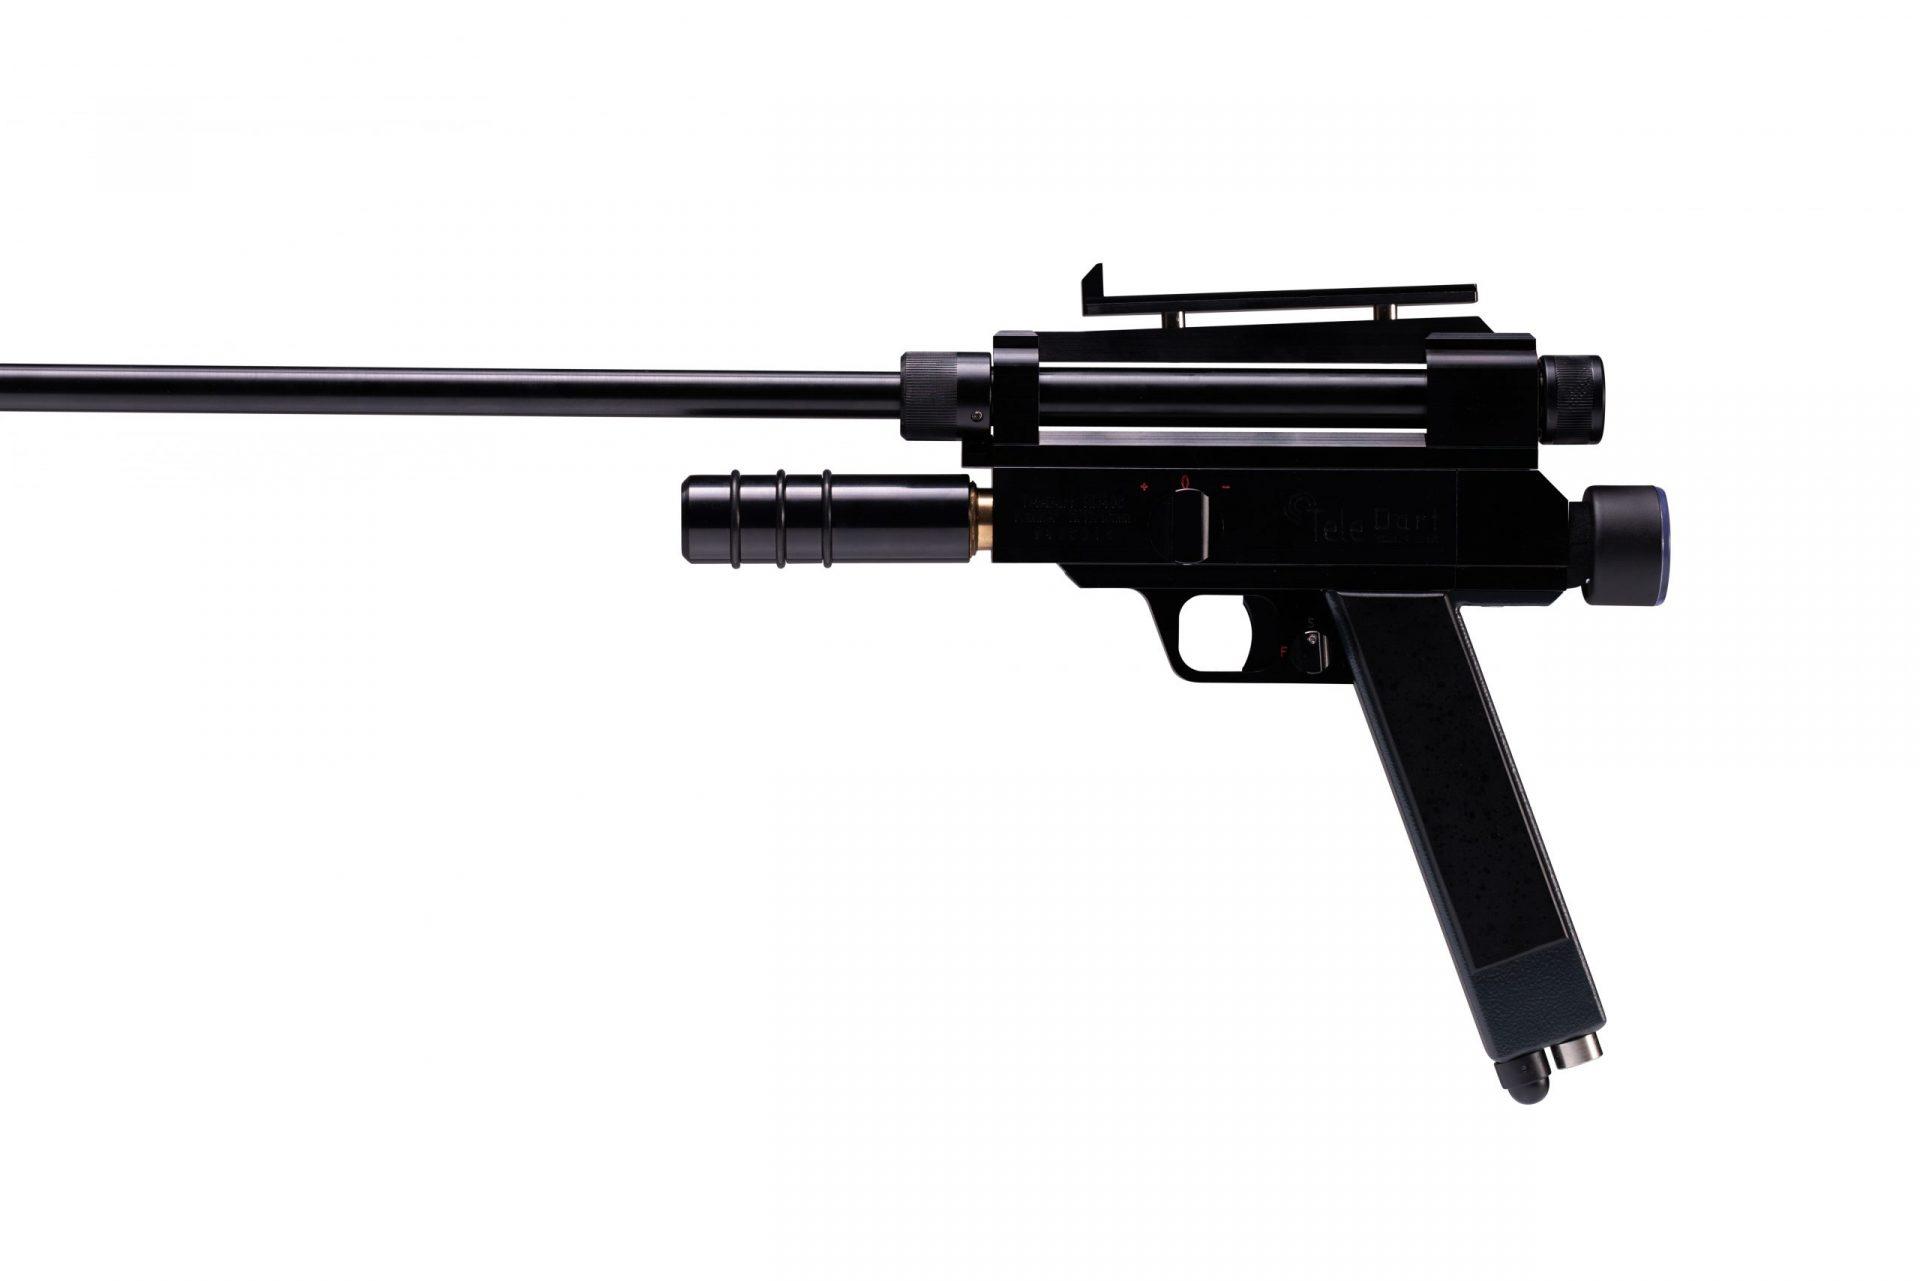 RD406 Narkosepistole